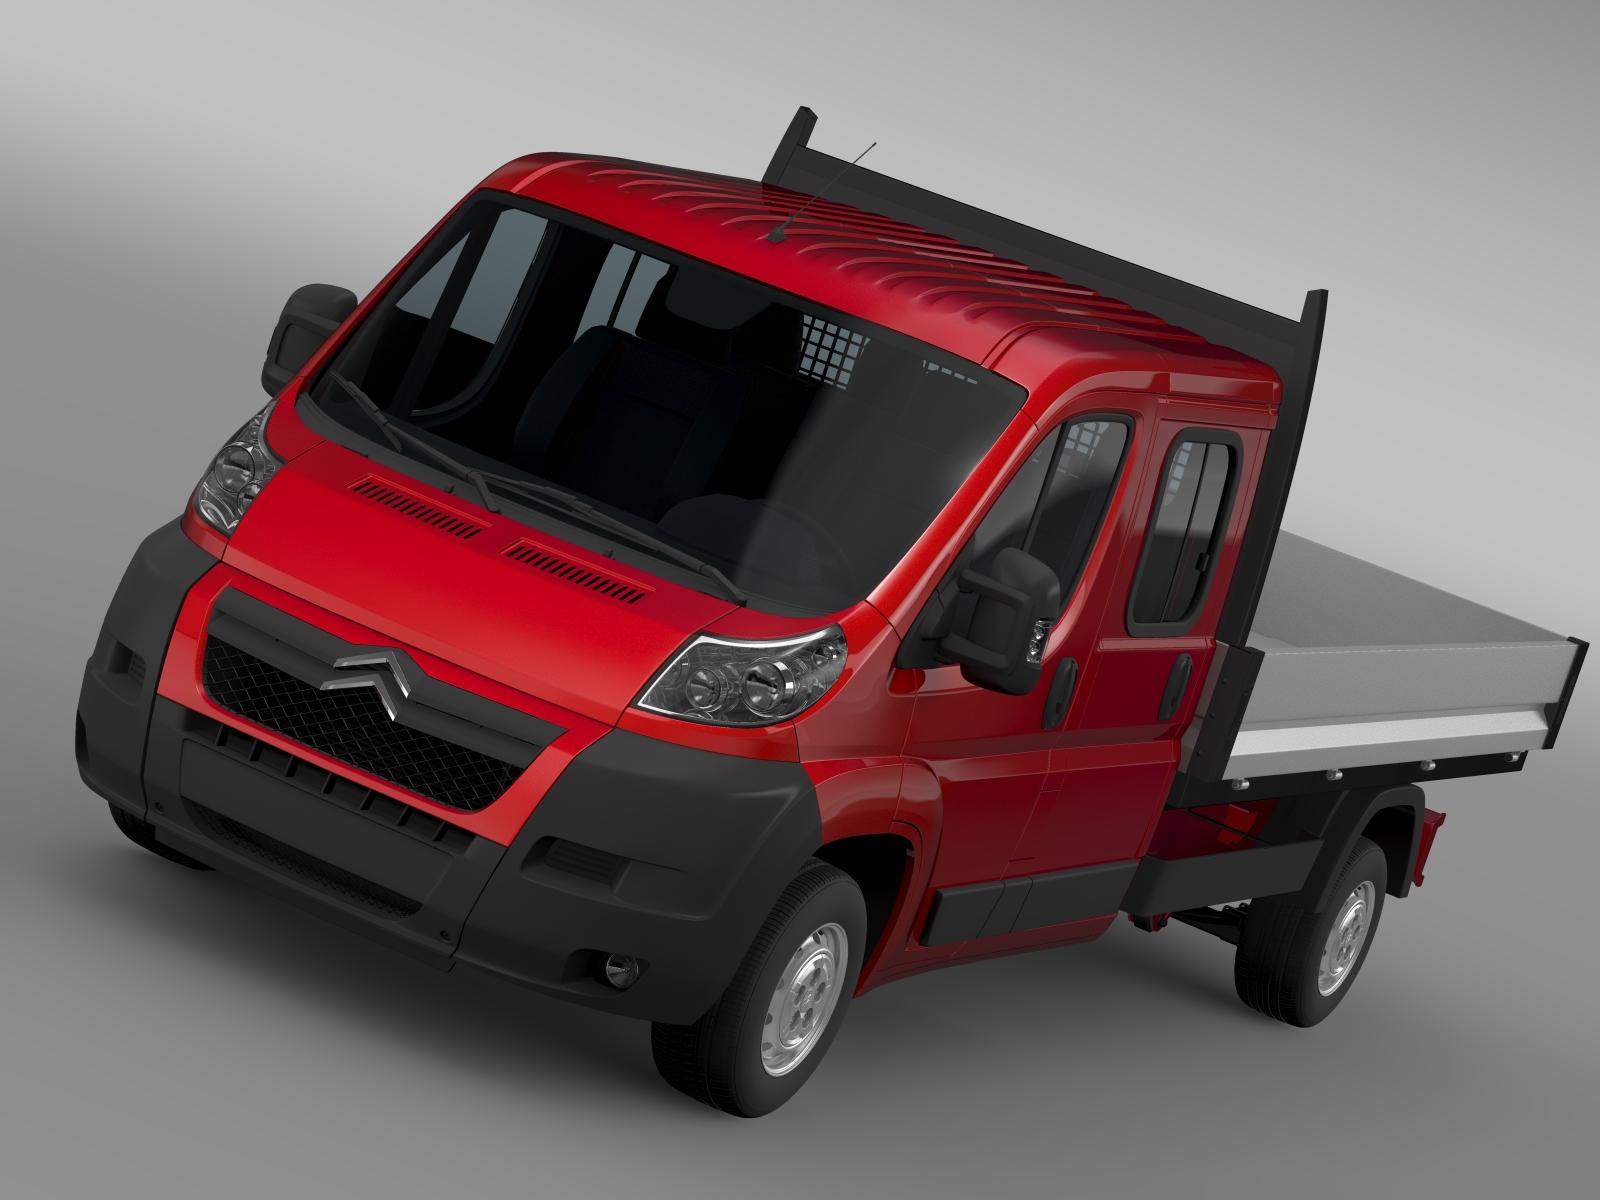 Citroen جمپر عملے کی ٹیک ٹرک 2009-2014 3D ماڈل 3ds زیادہ سے زیادہ FbX C4D دو MA MBC XSI obj 218642